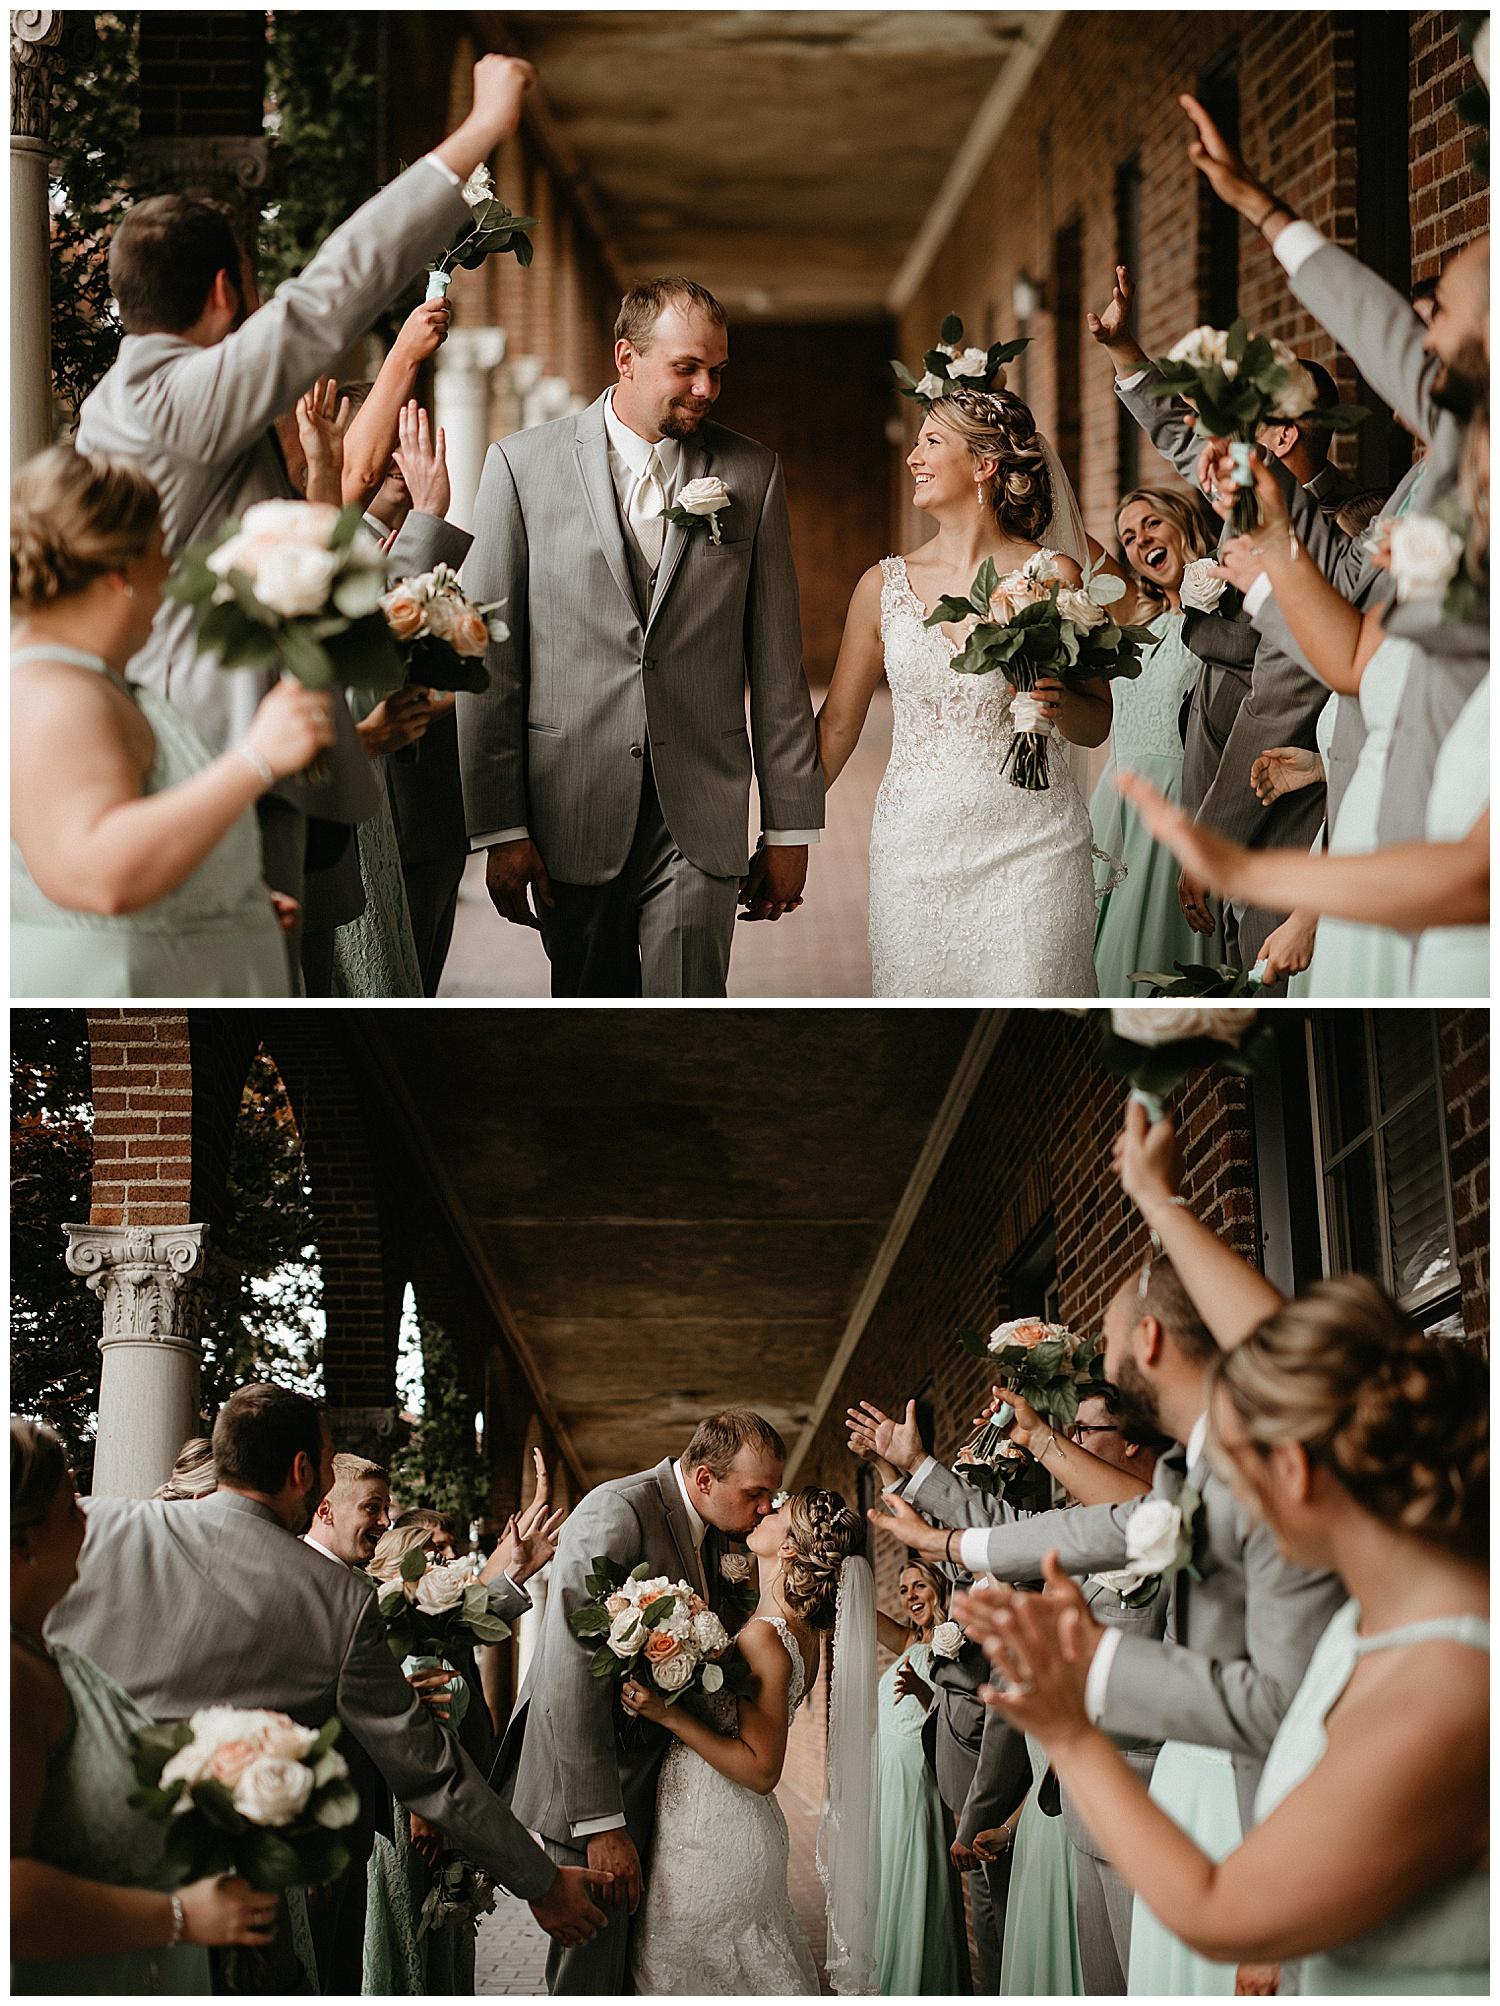 NEPA-Lehigh-Valley-Wedding-Photographer-at-Fountain-Springs-Country-Inn-Ashland-PA_0030.jpg